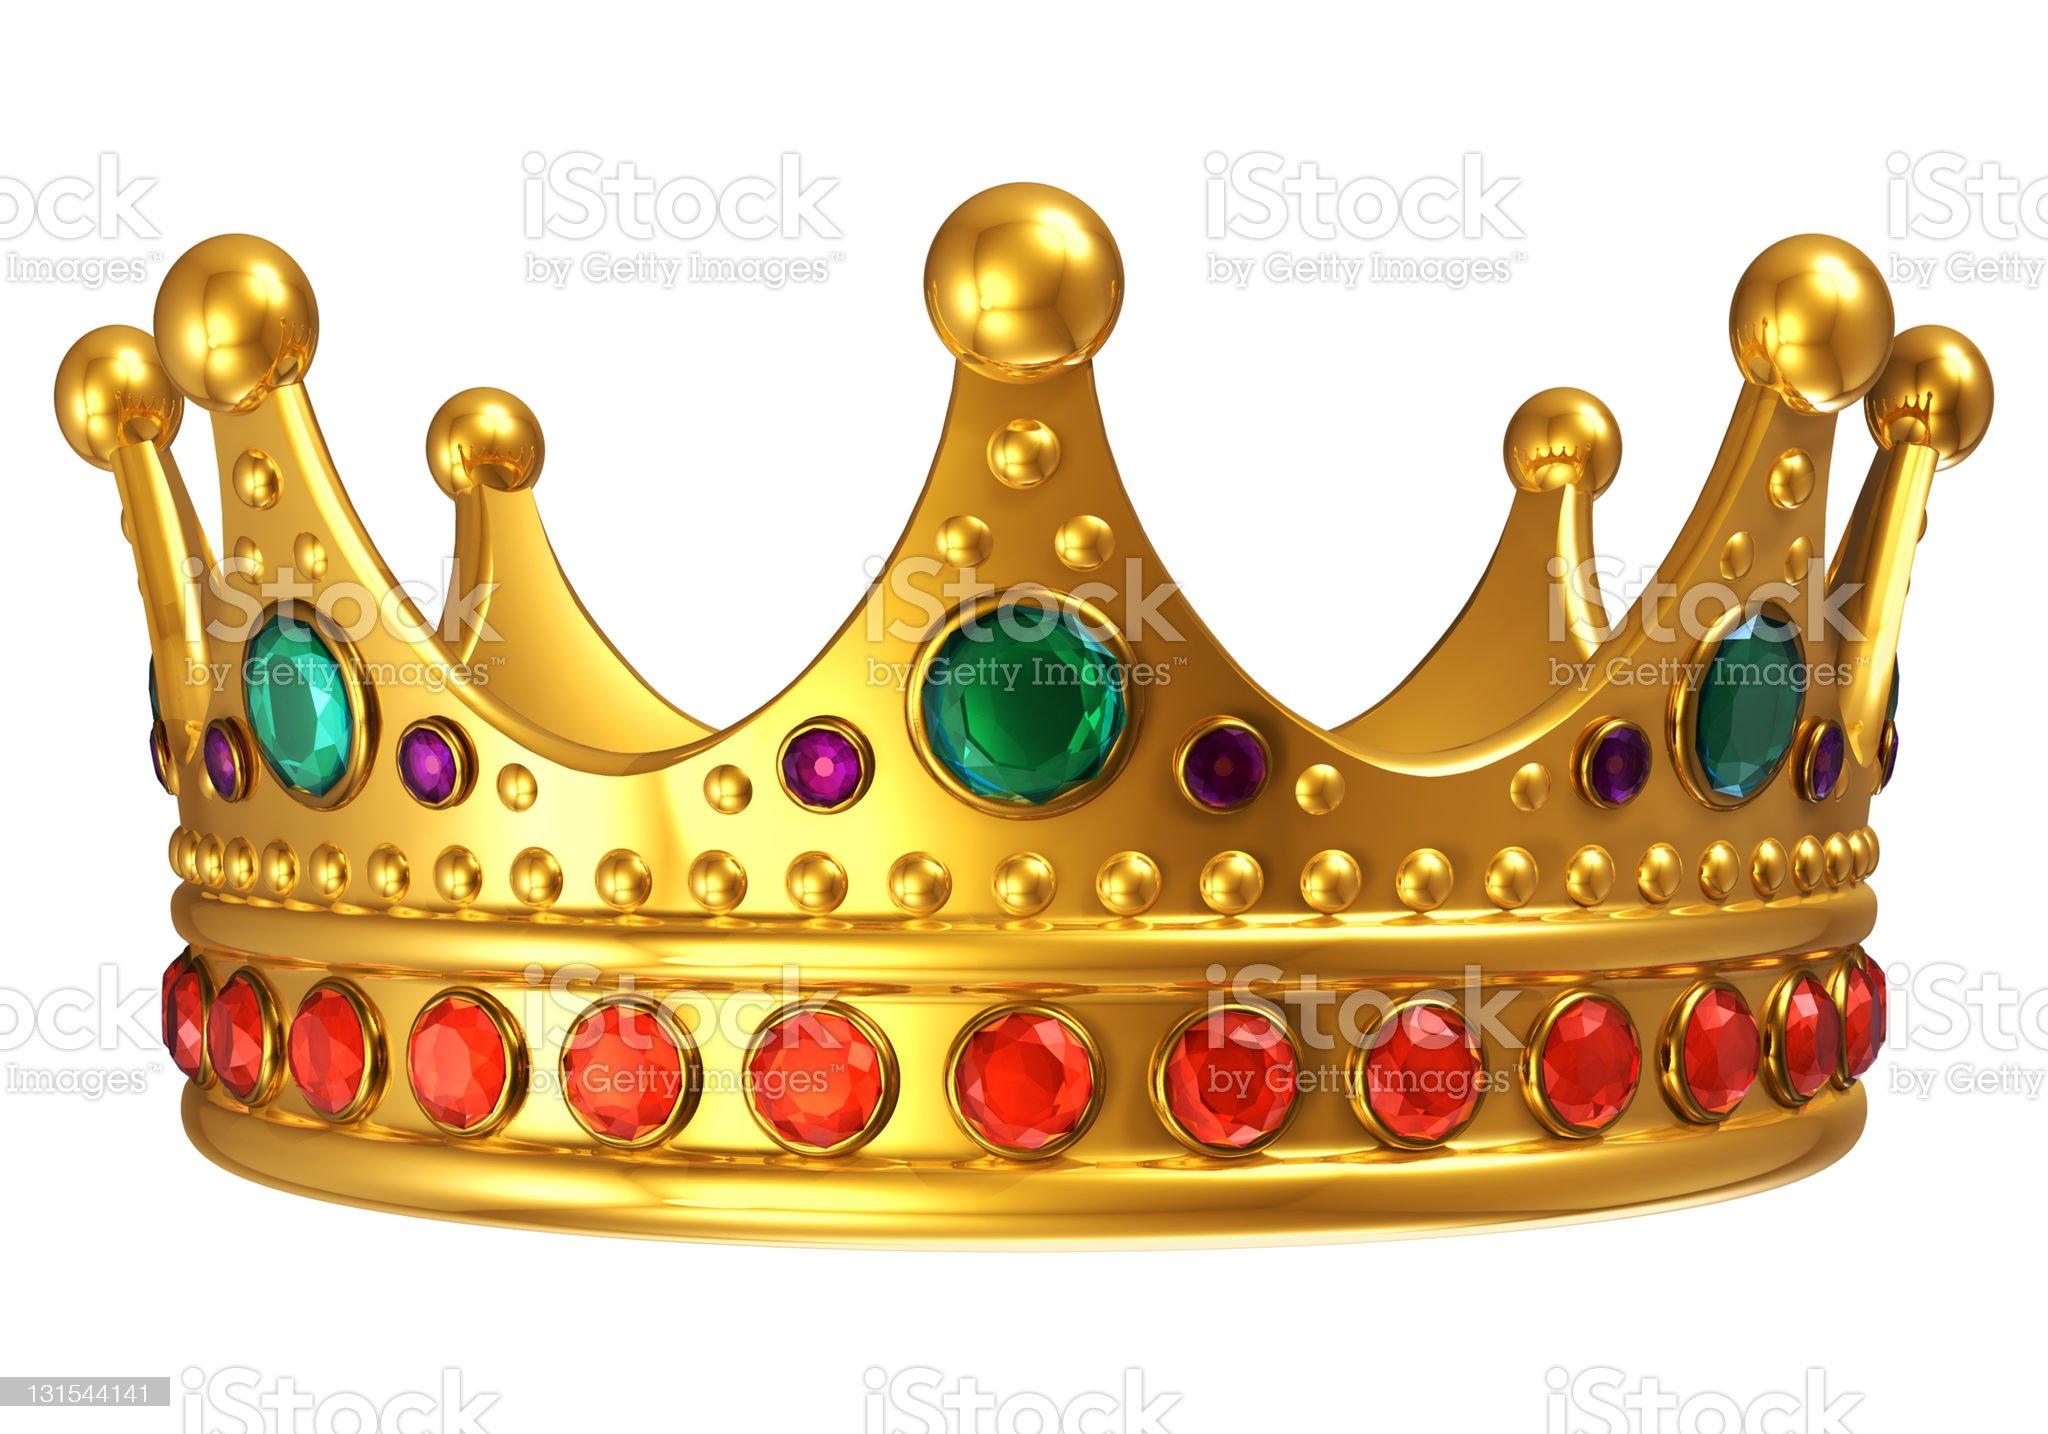 Golden royal crown royalty-free stock photo